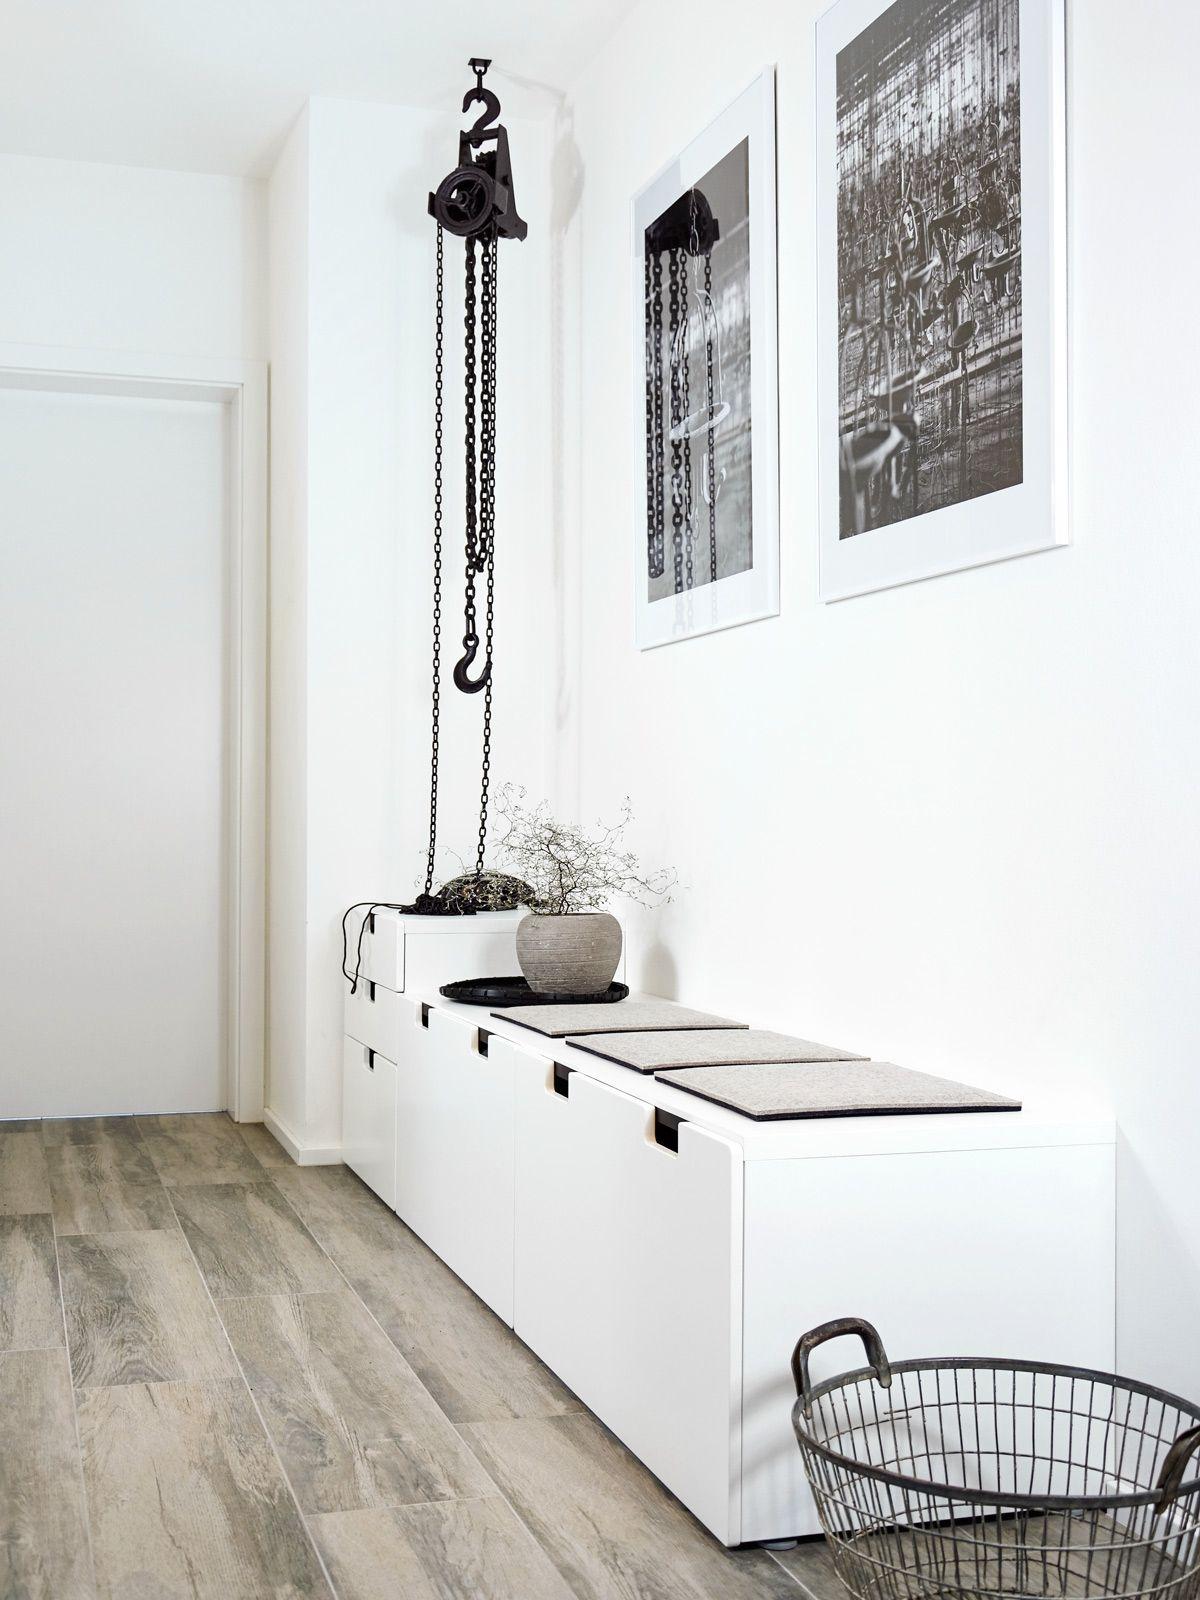 der neue Flur! | Hall, Corridor and Apartment entrance